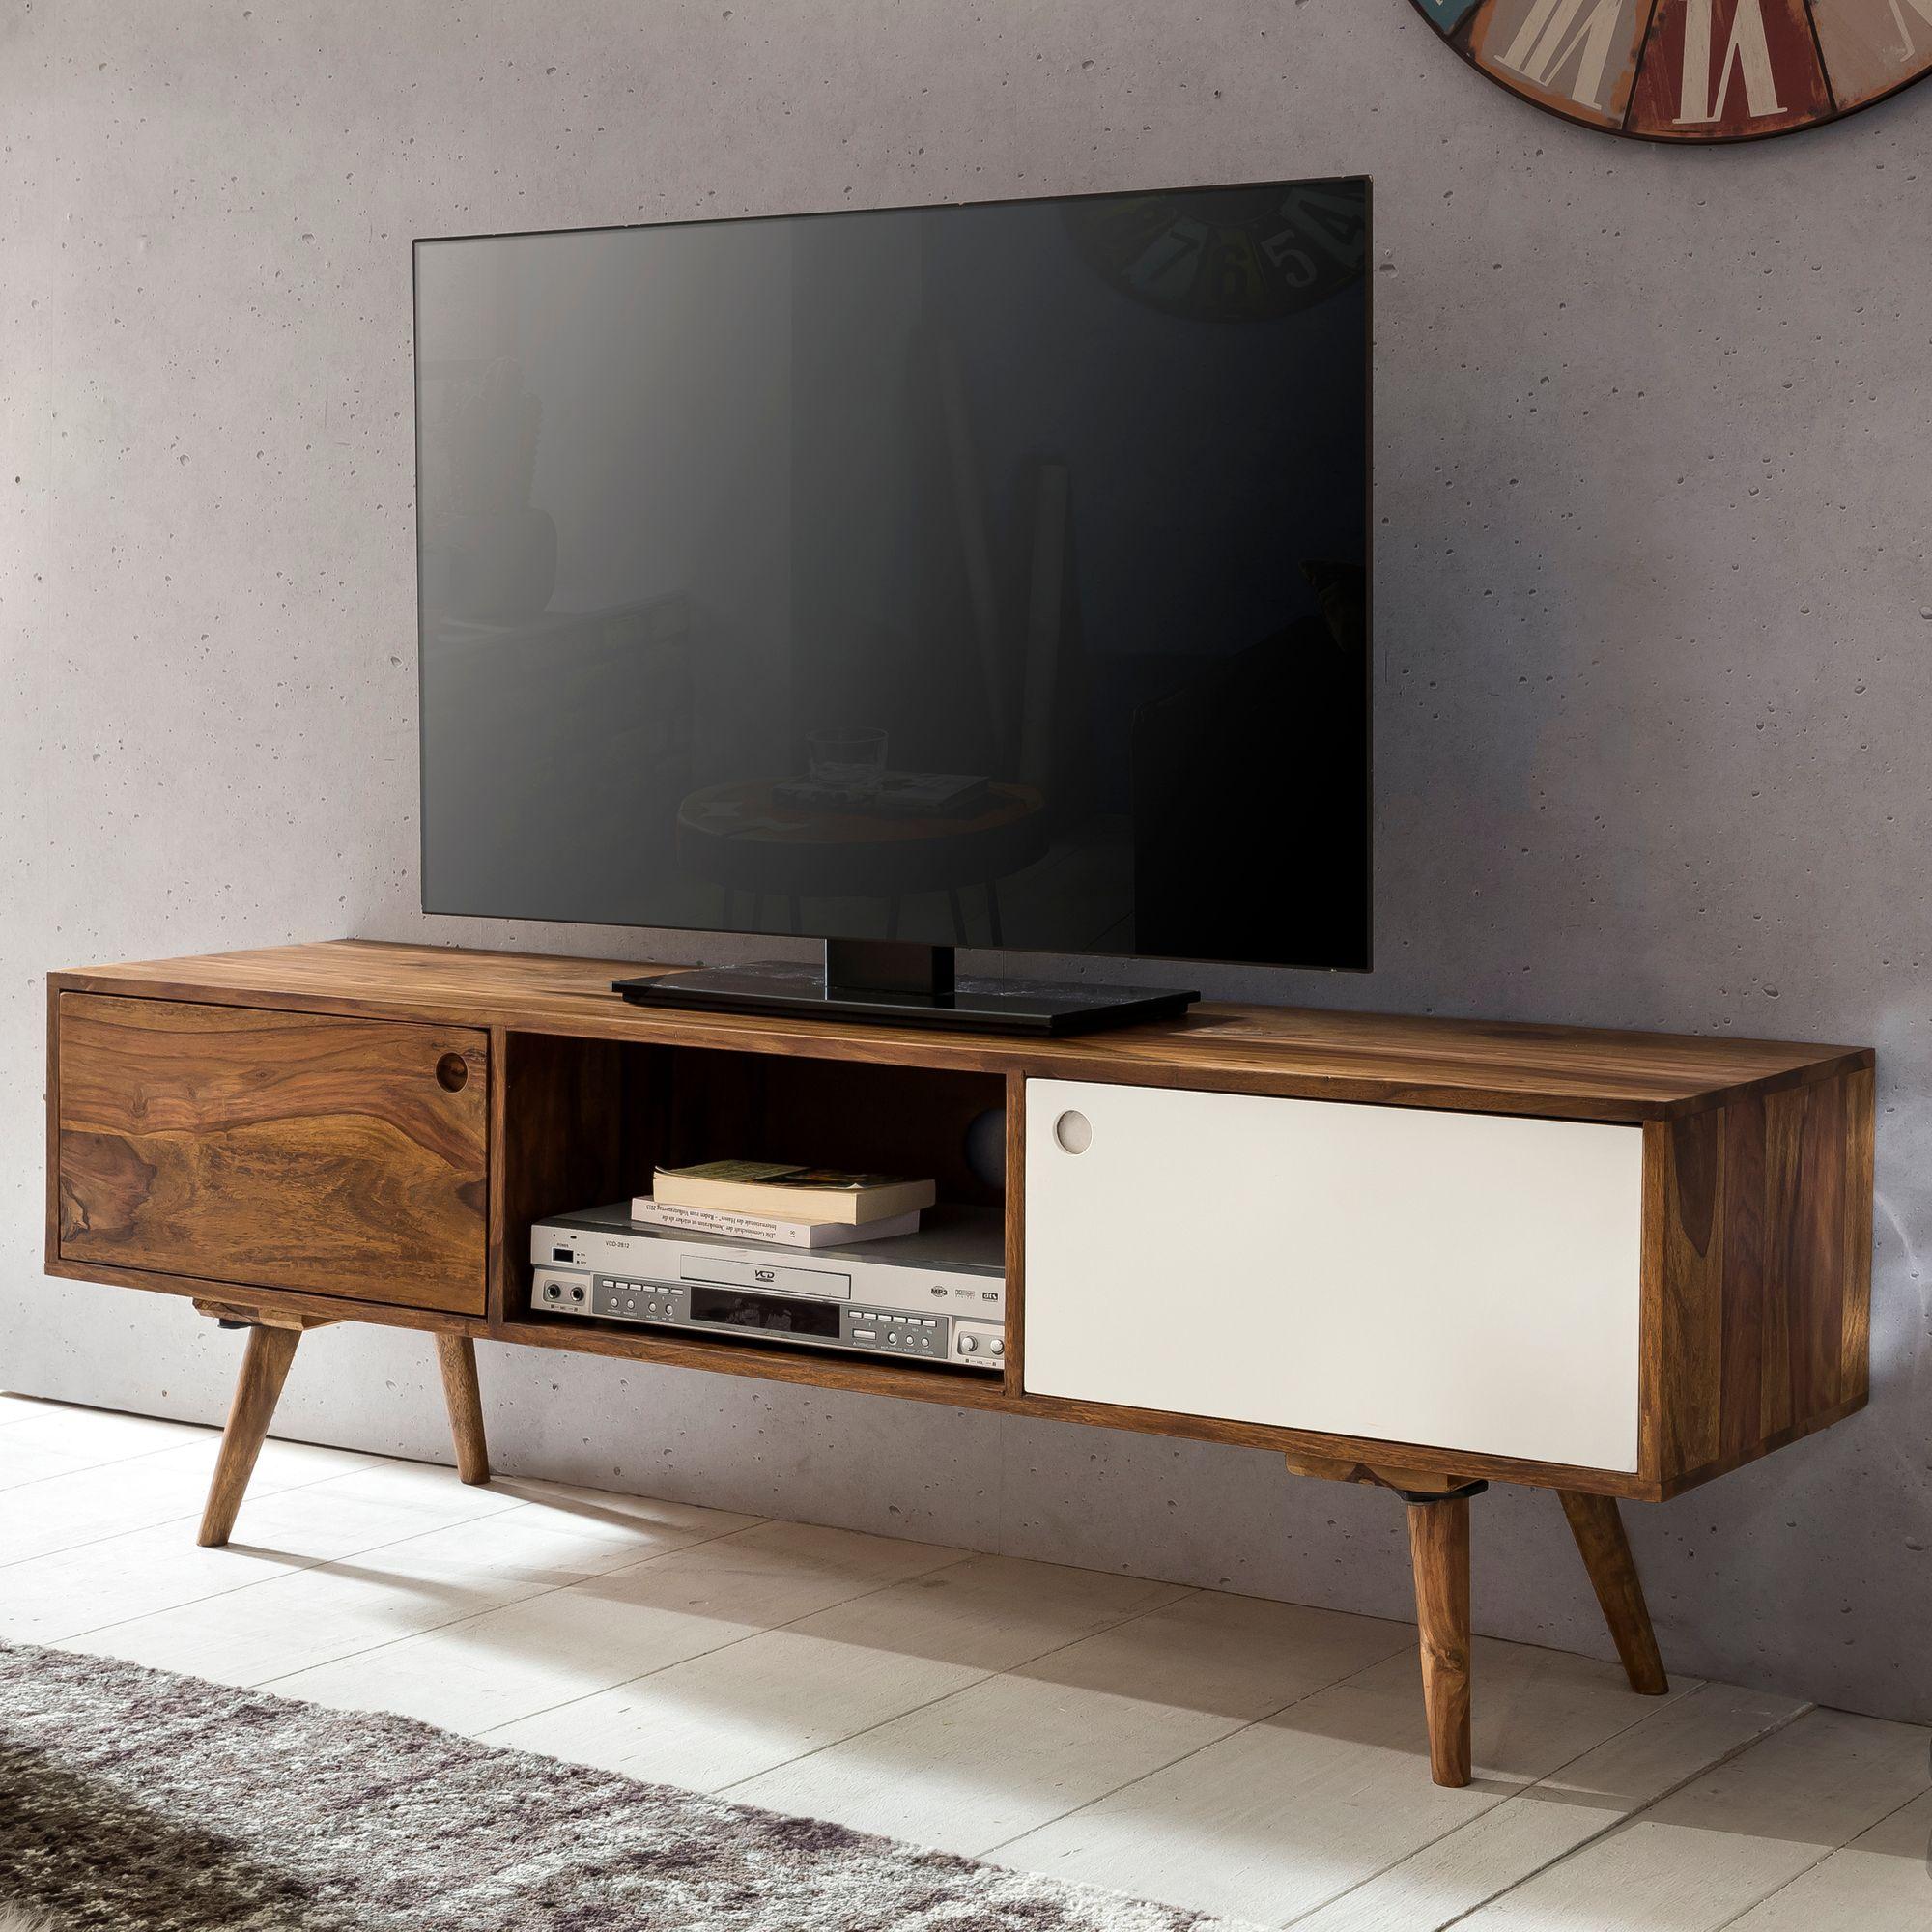 Tv Lowboard Repa 140 Cm Massiv Holz Sheesham Landhaus 2 Turen Fach